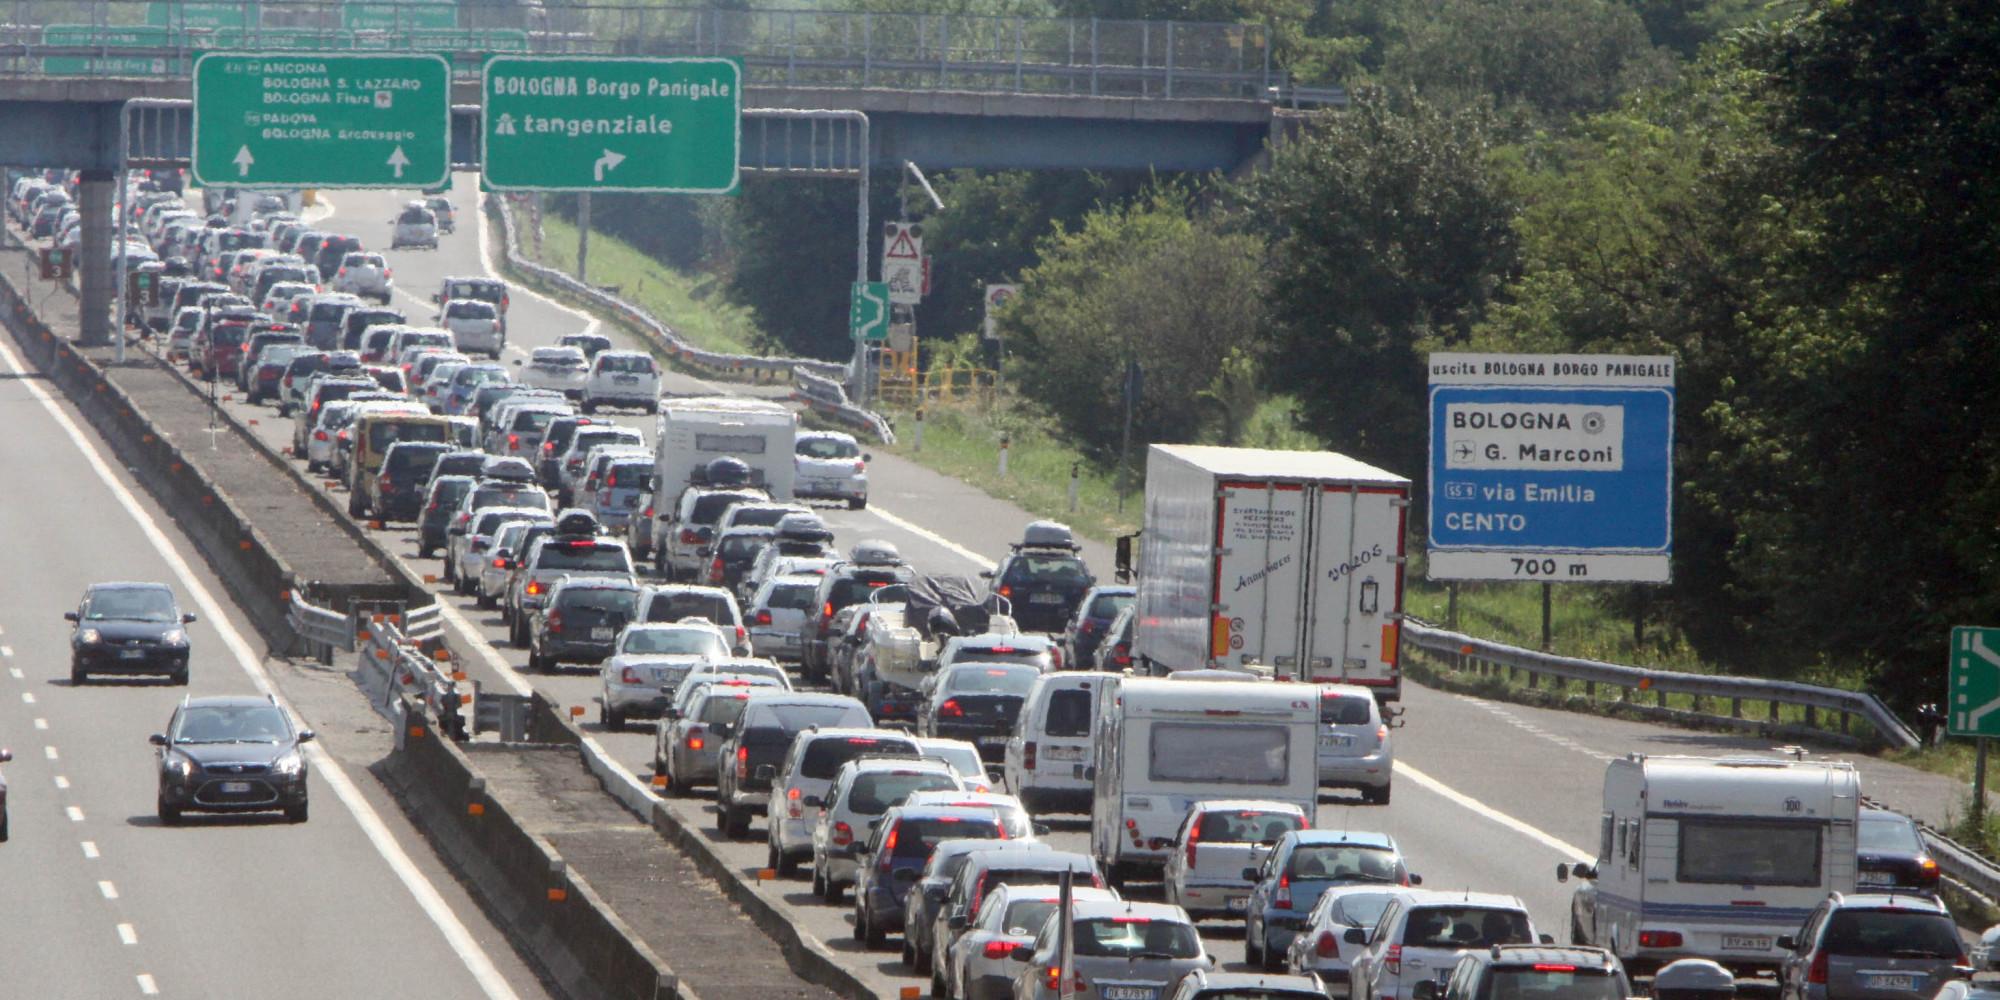 autostrada milano rimini traffico - photo#9